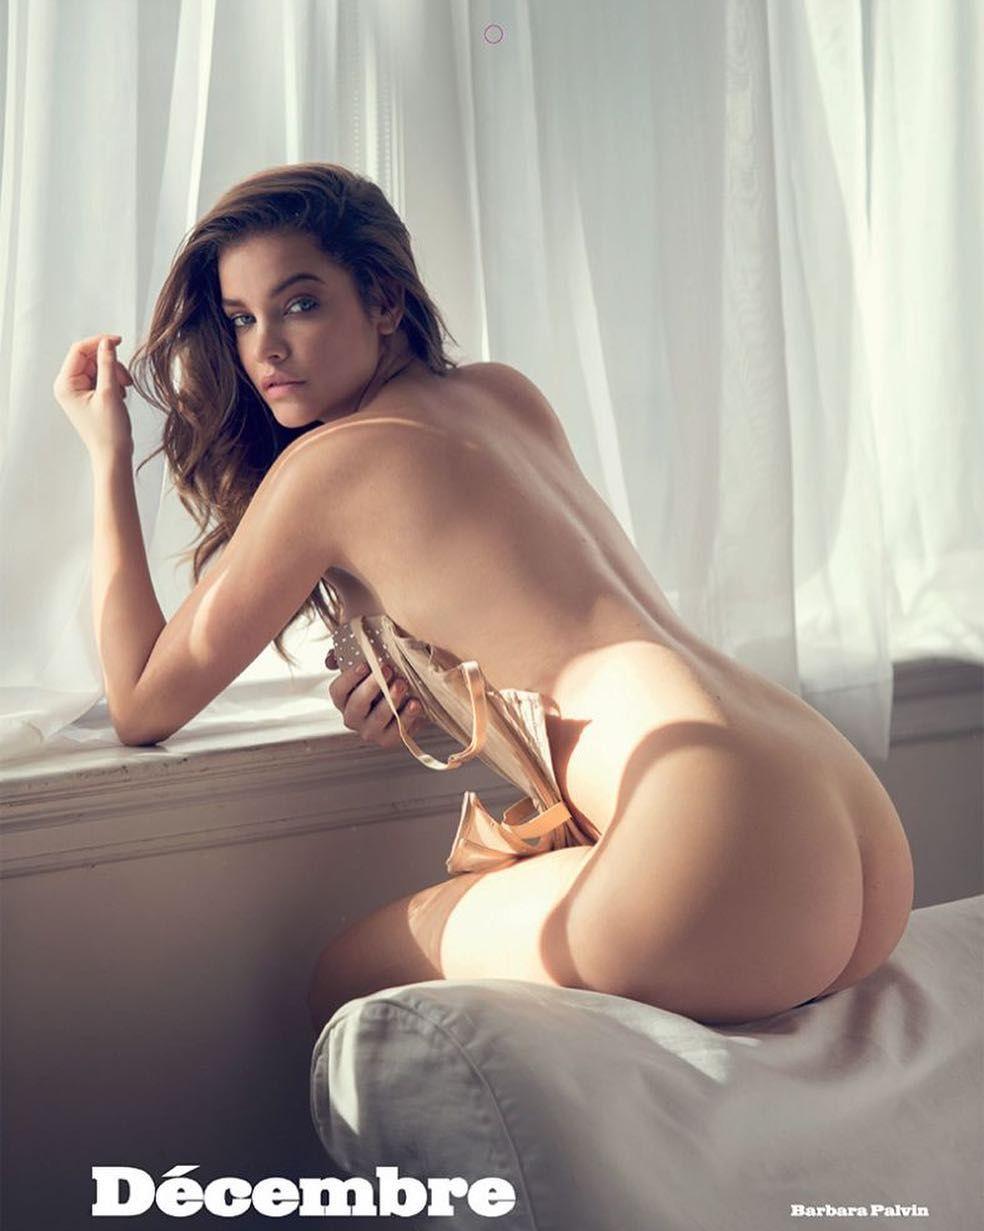 Milan dixon nude sexy 27 Photos,Fabianny zambrano Porno pictures Olivia munn braless in vancouver pokies,Tove lo sexy topless 9 Photos